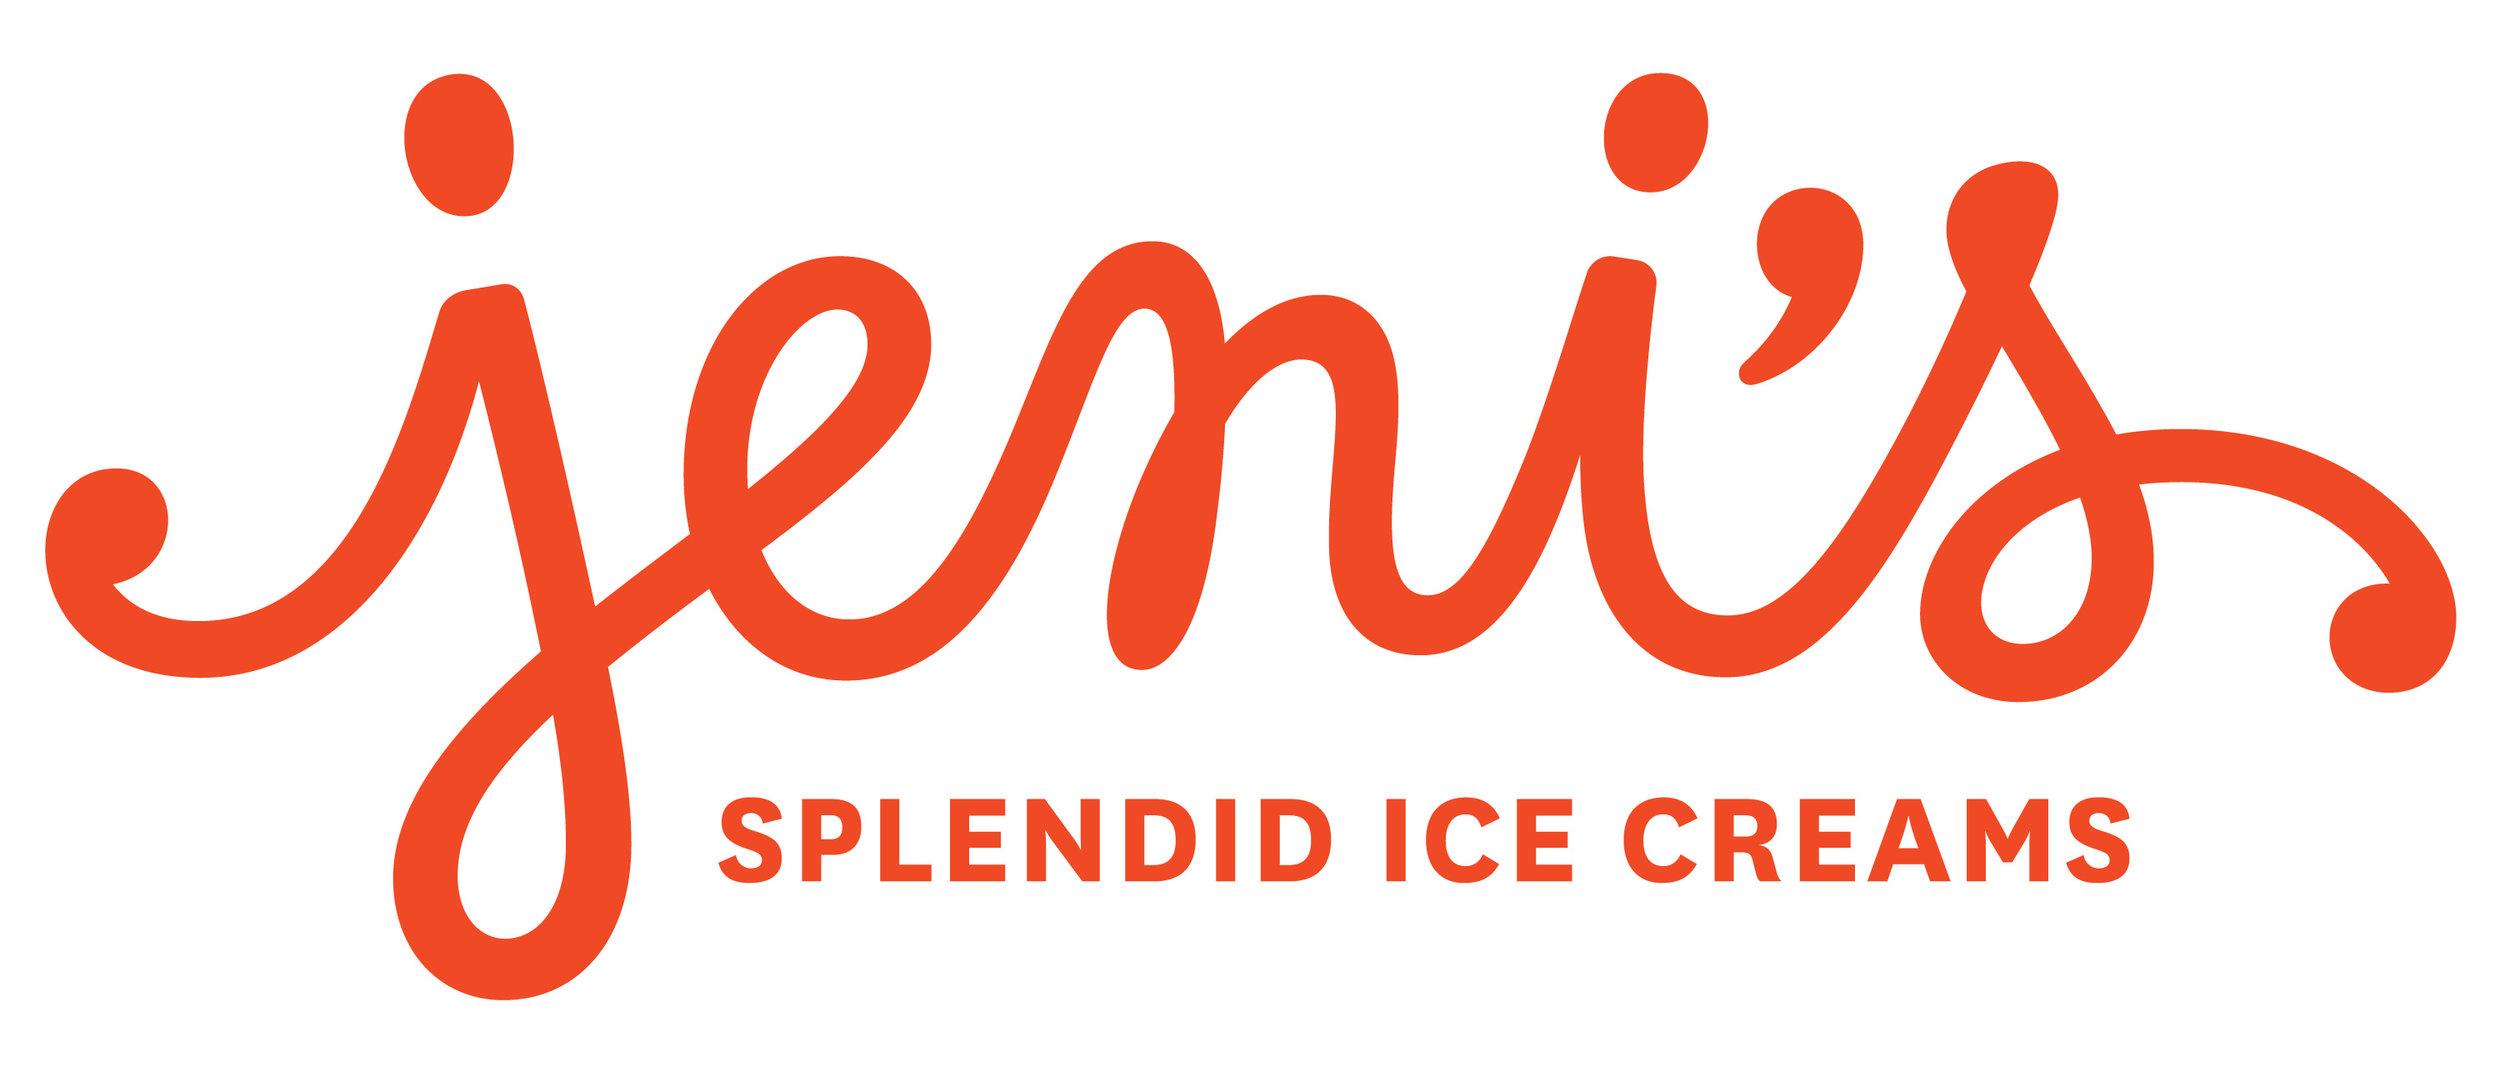 Jenis-Splendid-Ice-Creams-Logotype.jpg